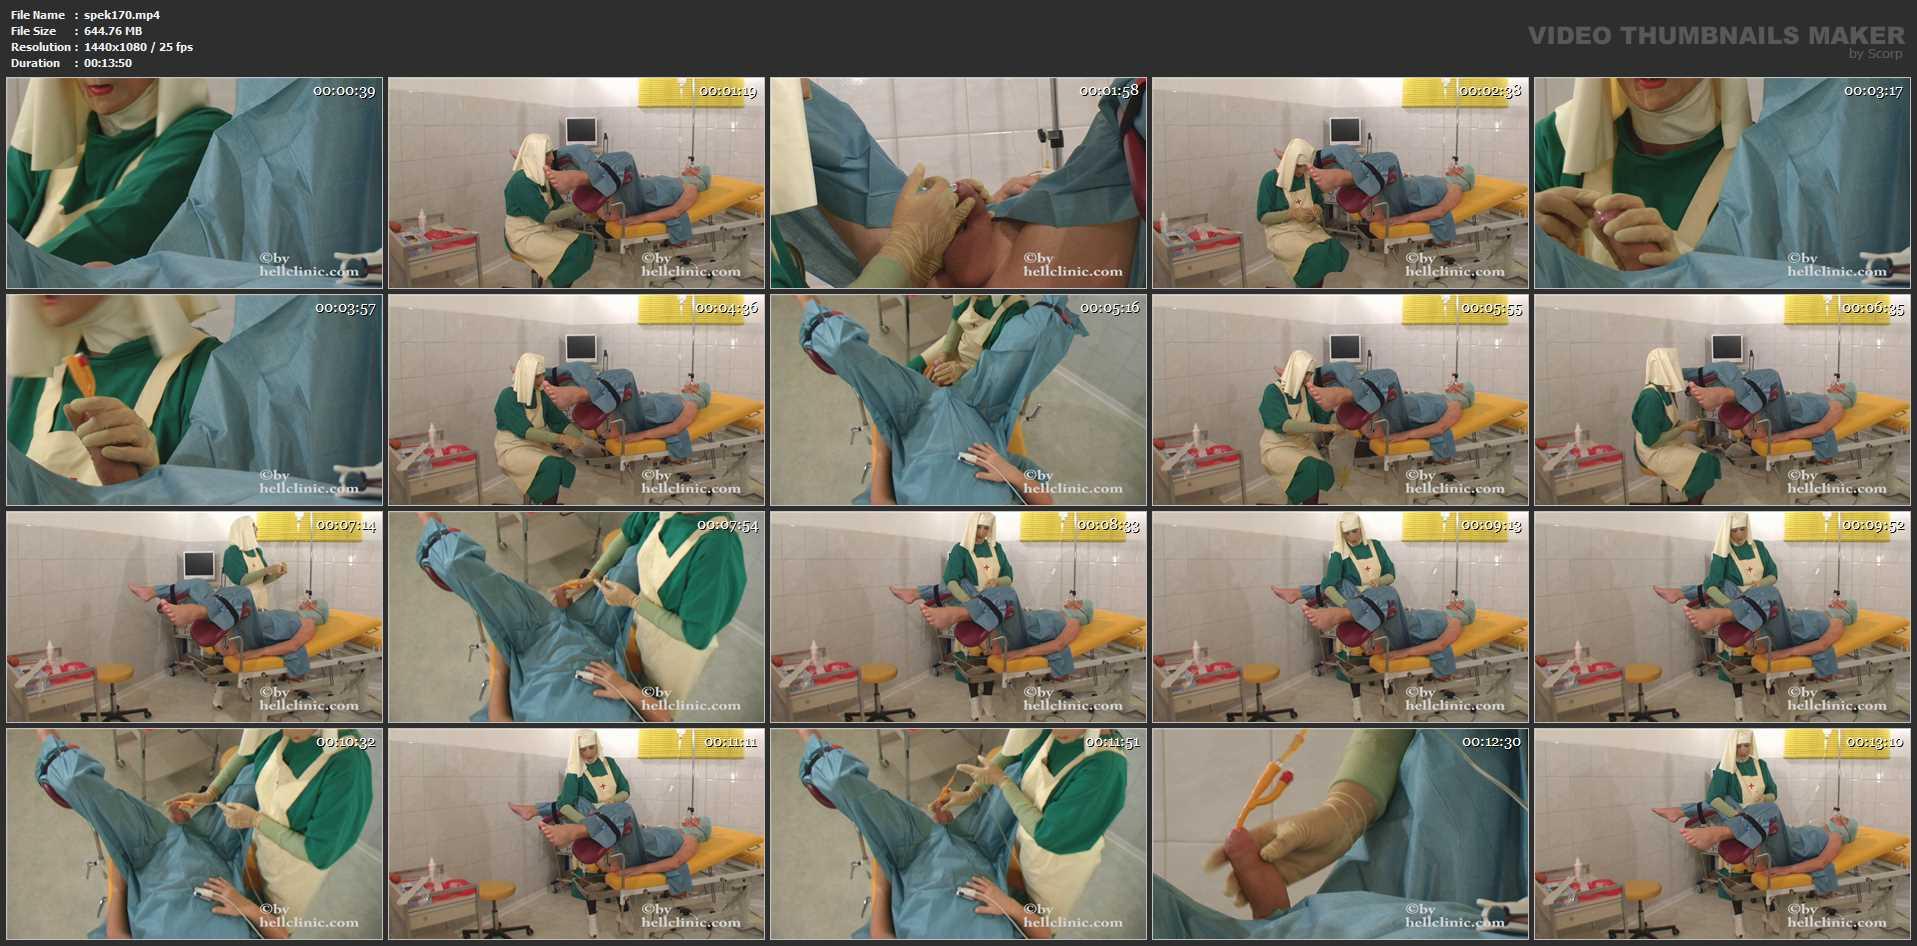 [SPEKULA] Intensive care - catheter [FULL HD][1080p][MP4]